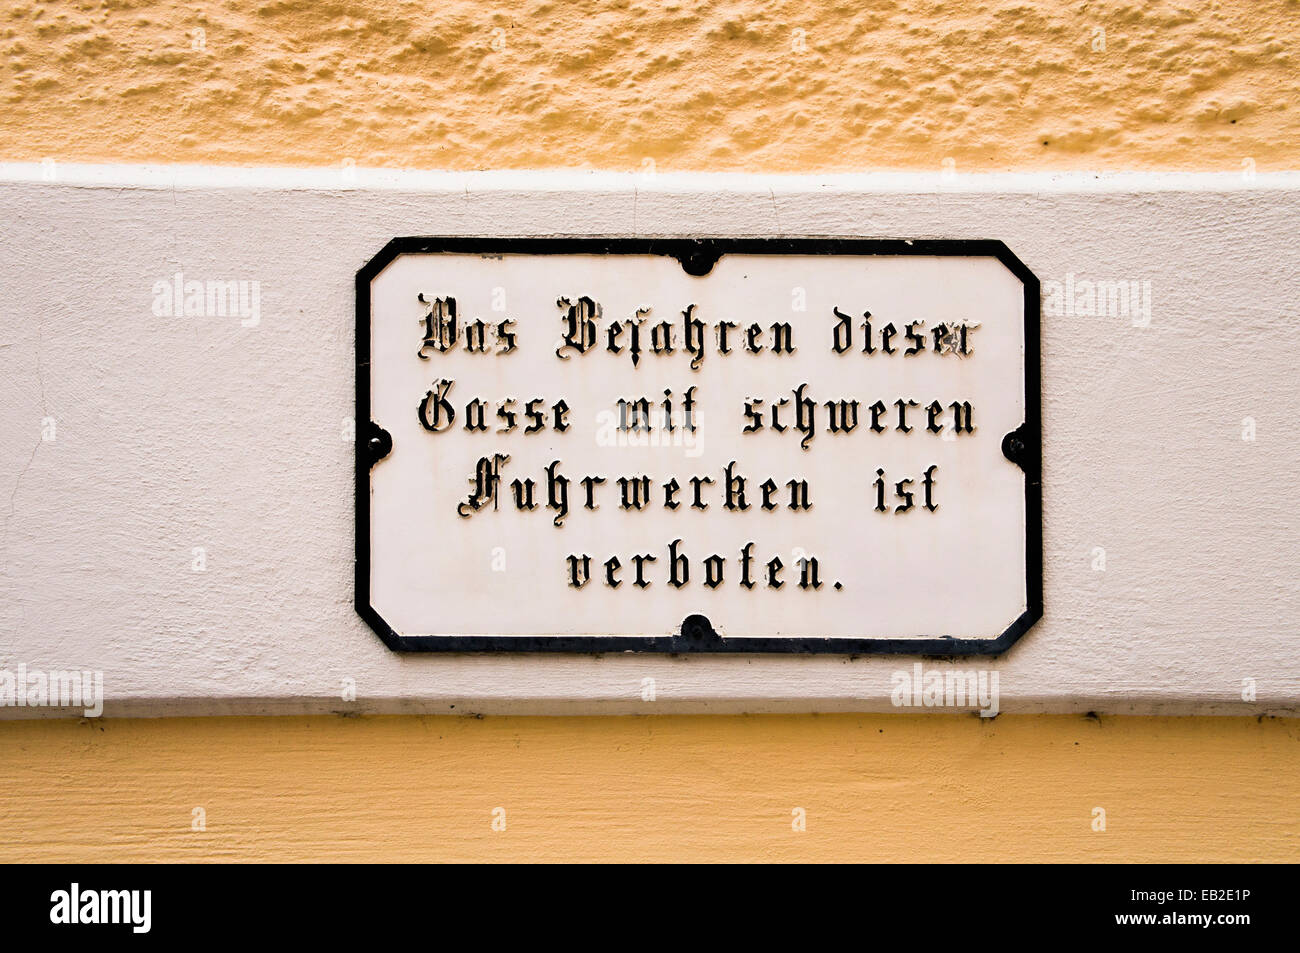 Schwabacher Typeface Stock Photos & Schwabacher Typeface